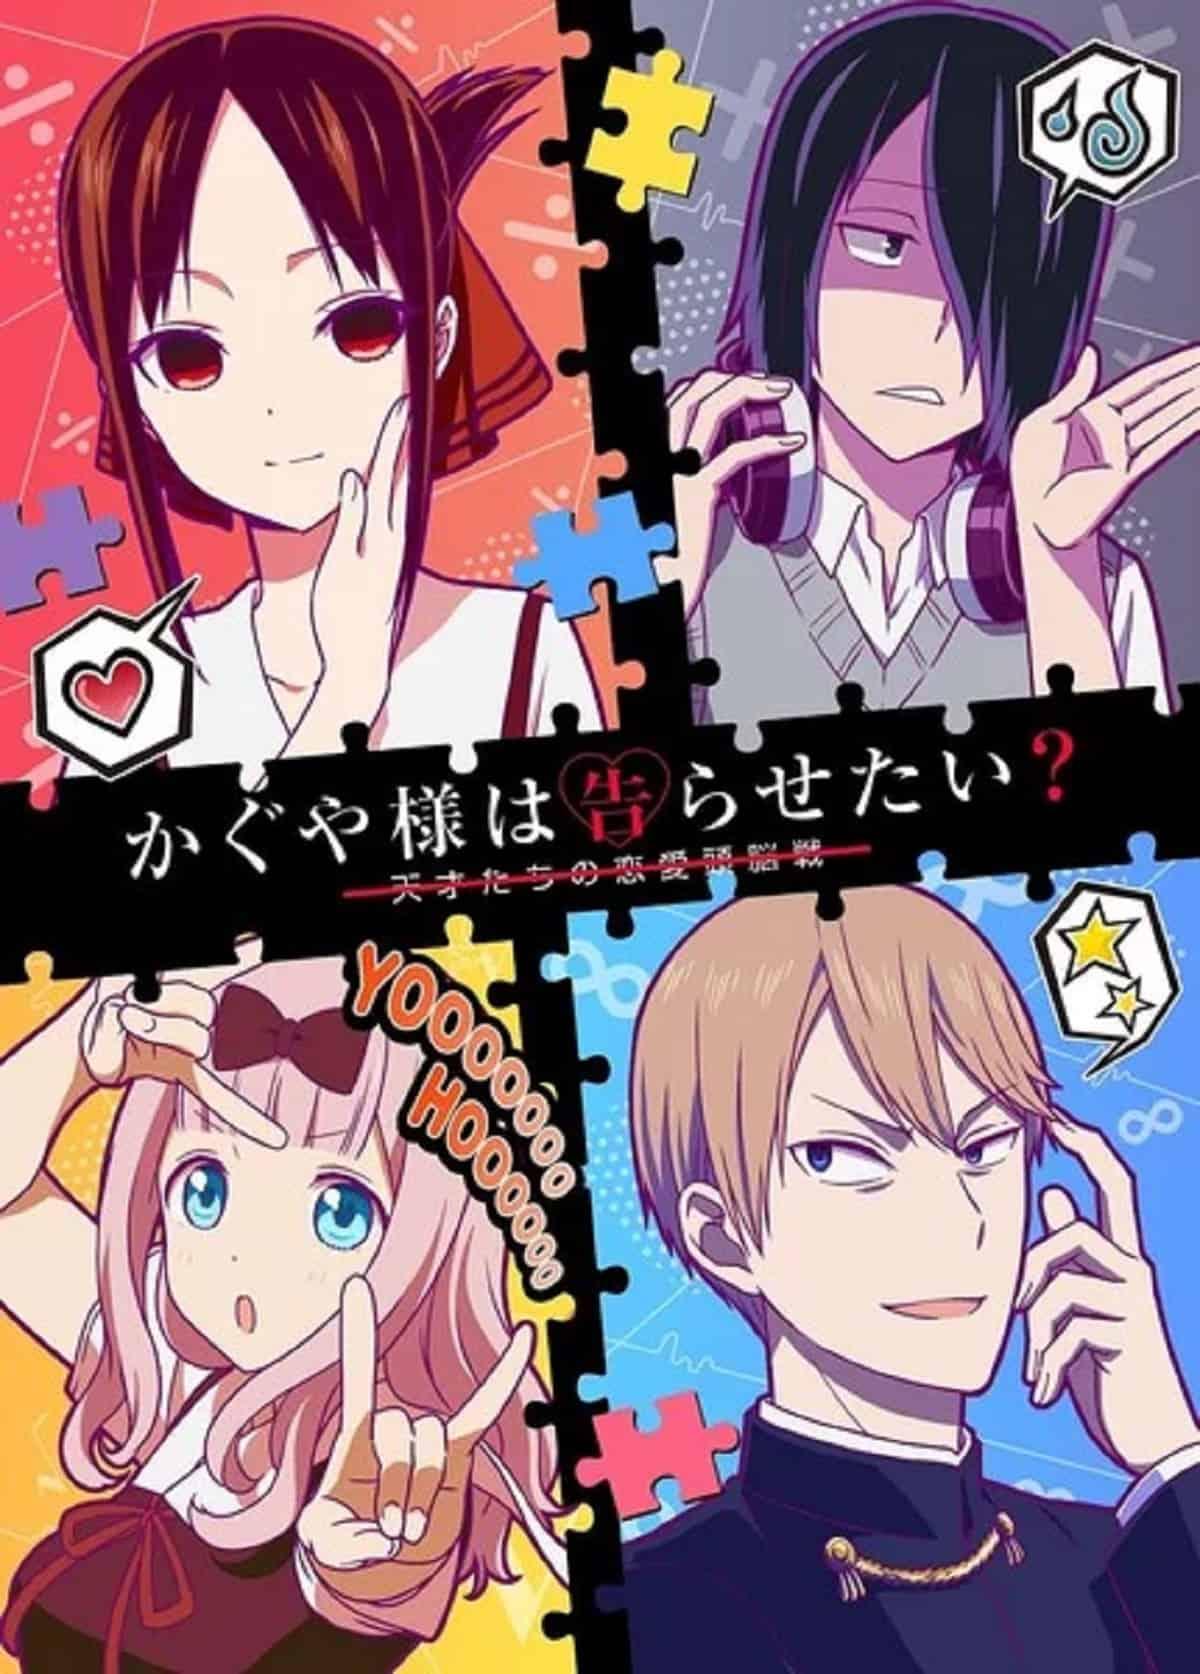 Season two promotional visual for Kaguya-sama: Love is War